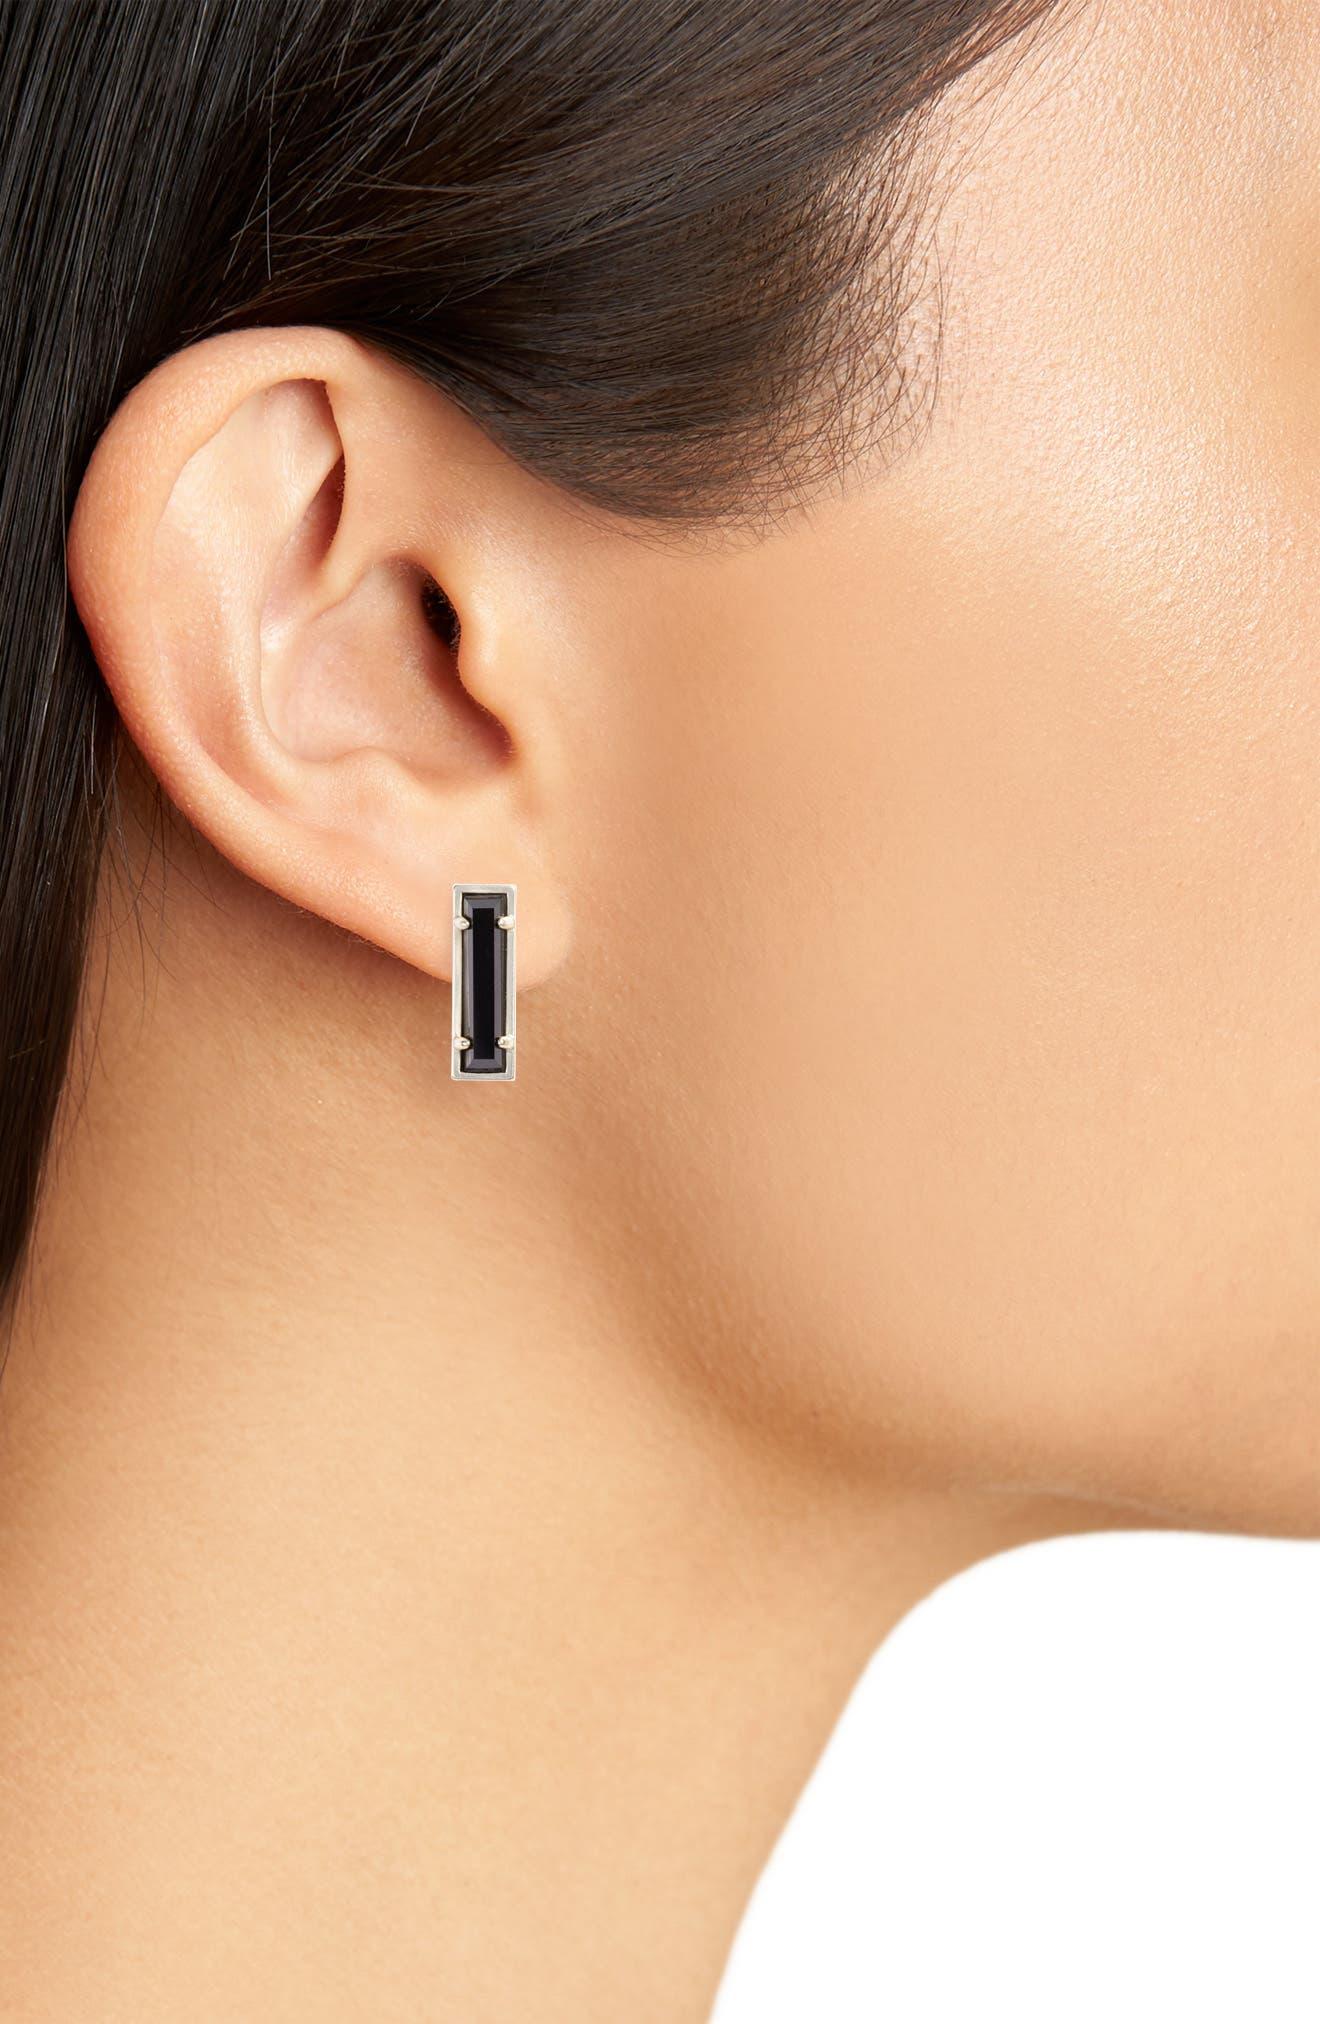 KENDRA SCOTT, Lady Stud Earrings, Alternate thumbnail 2, color, 002